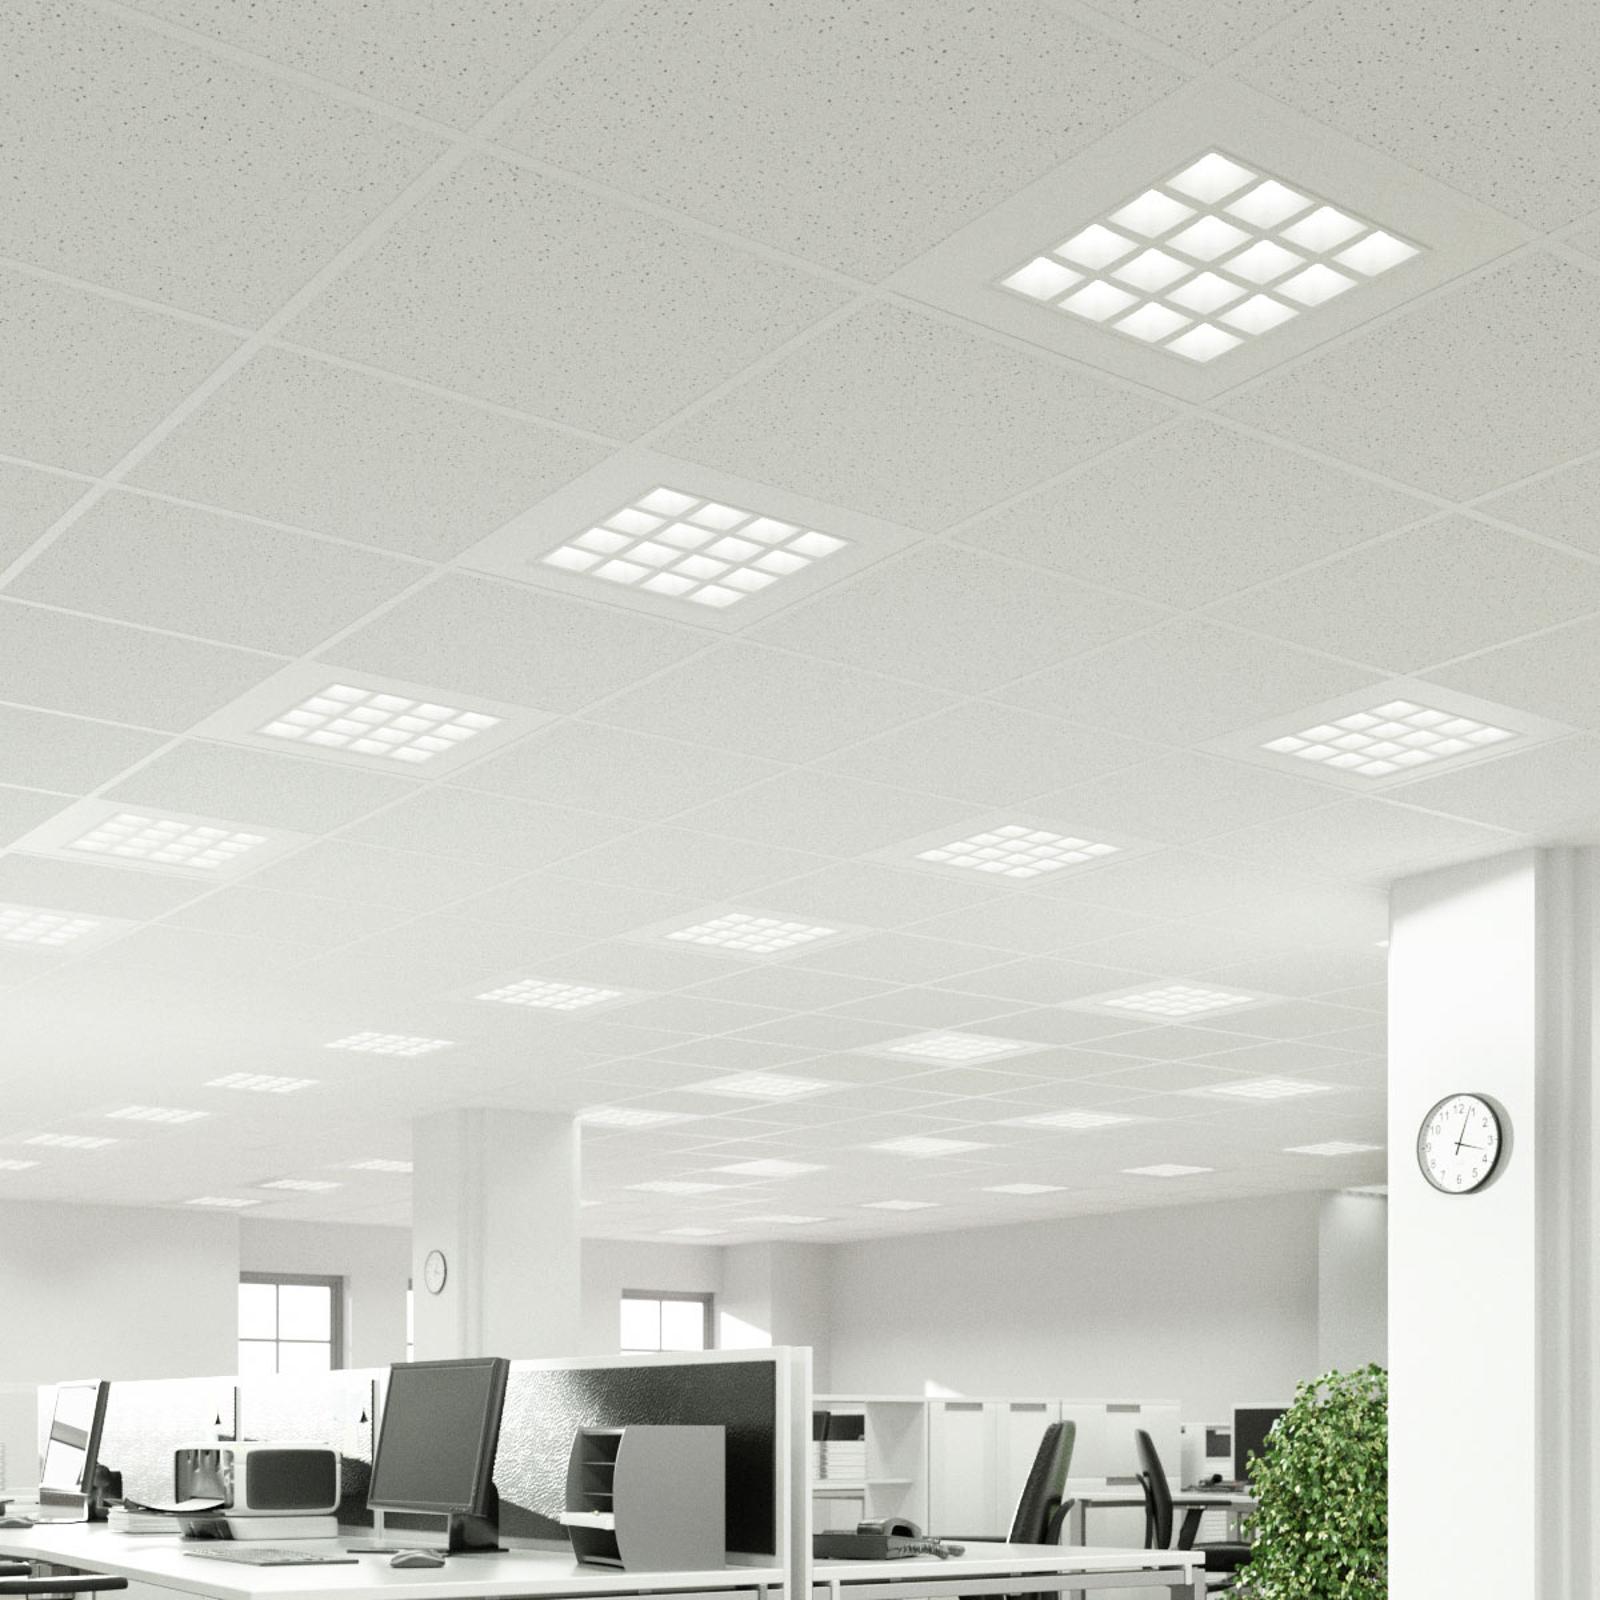 LED-indbygningspanel Merti i hvid, 4.000K